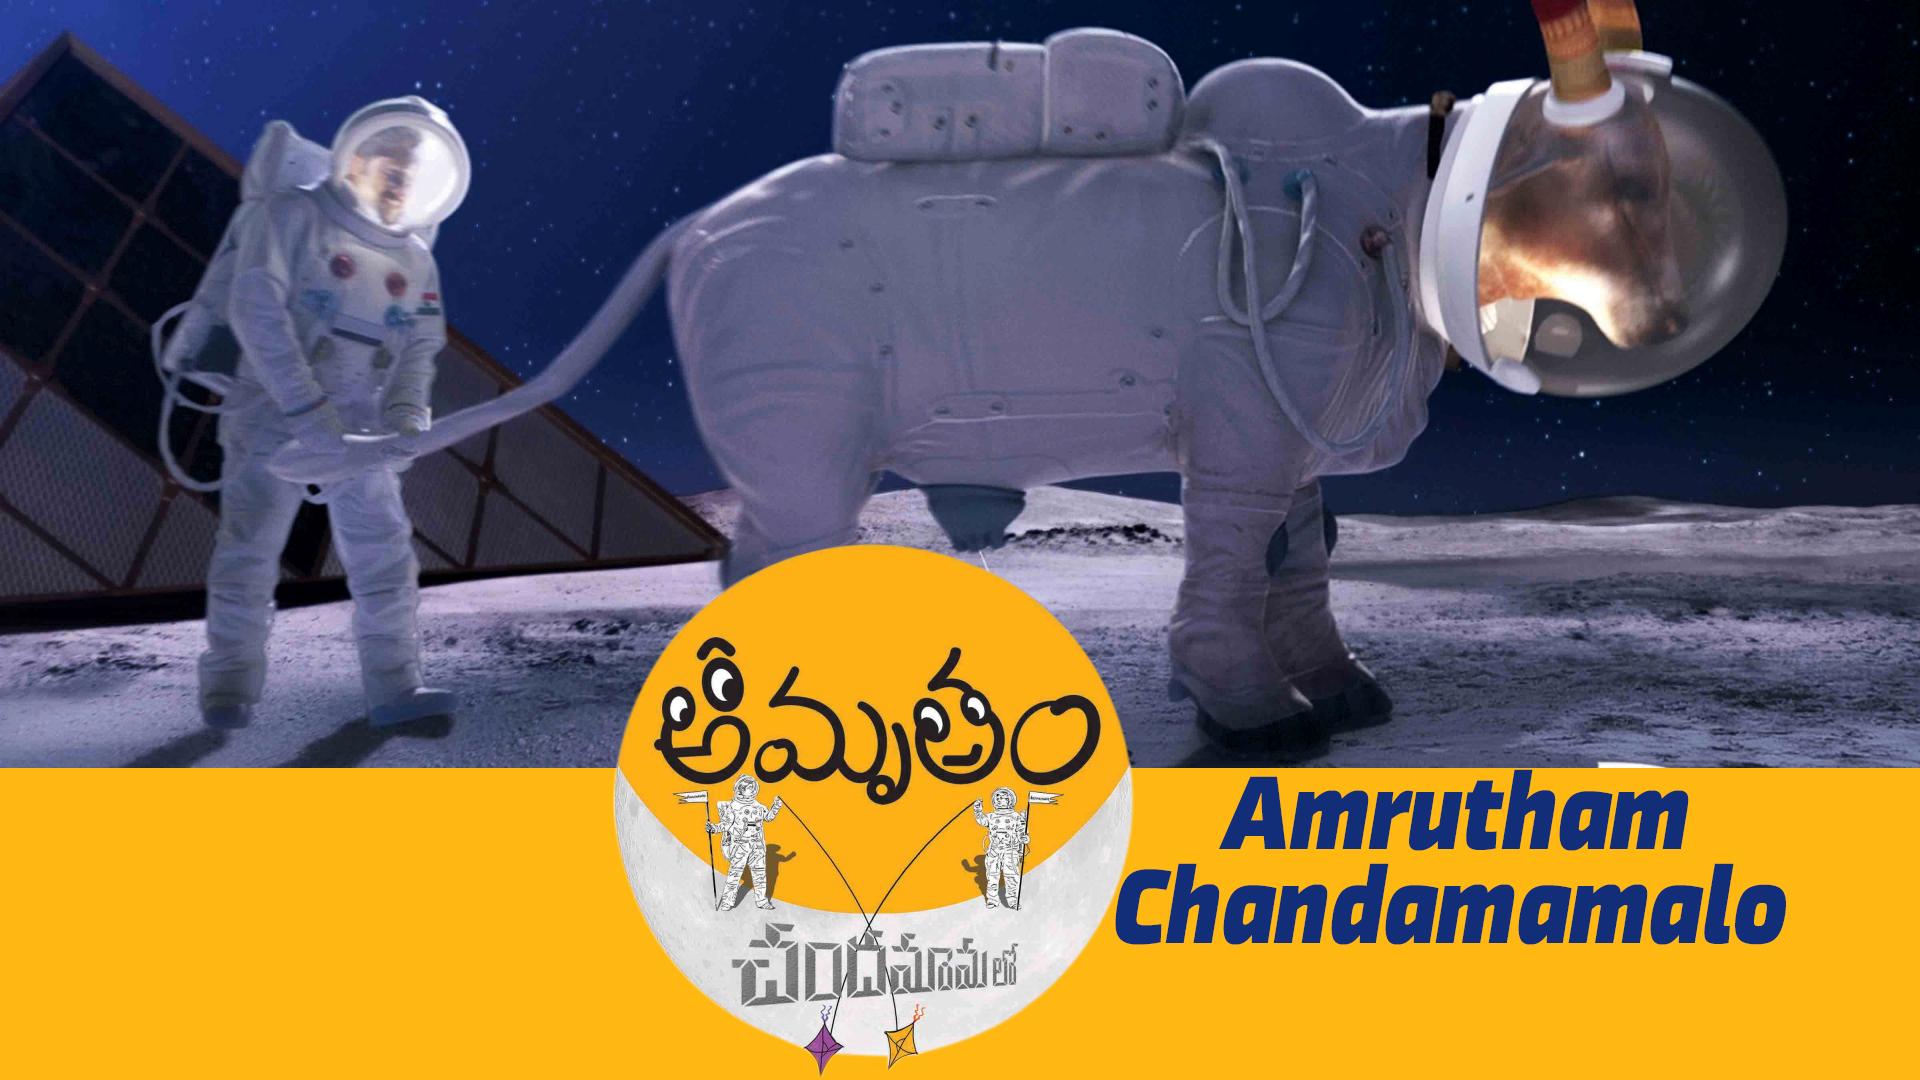 Amrutham Chandamama Lo